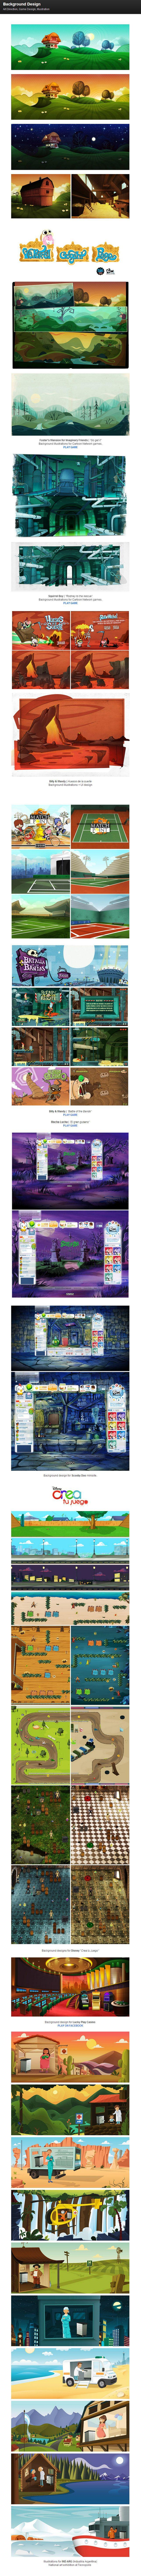 Background Design on Behance